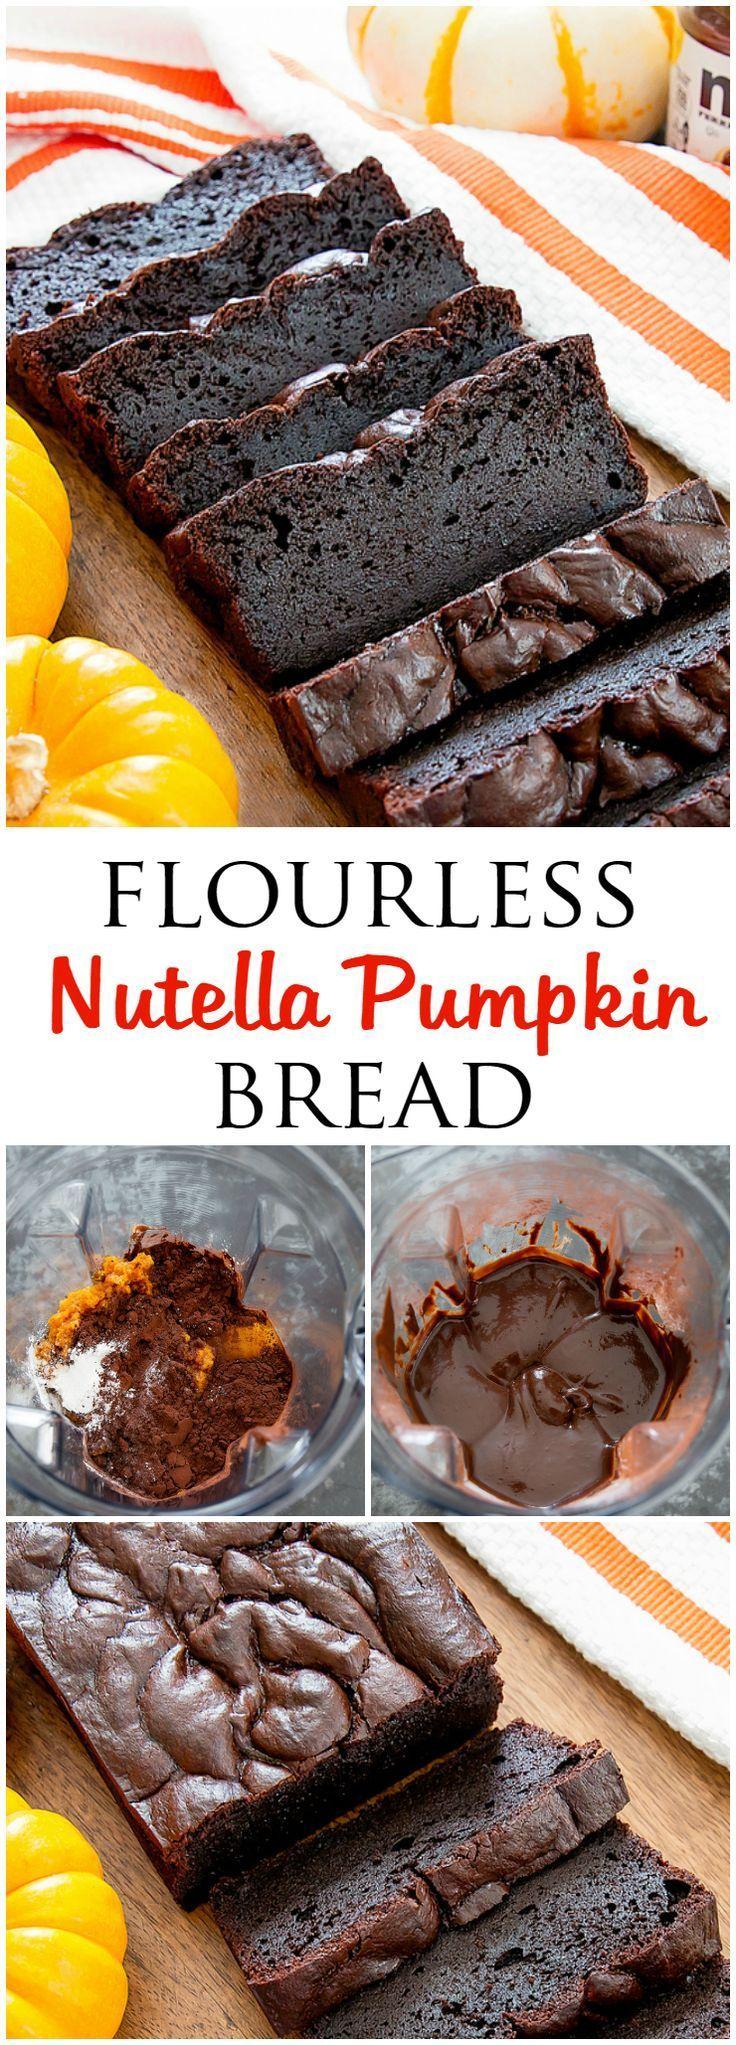 Flourless Nutella Pumpkin Bread Recipe Pumpkin recipes